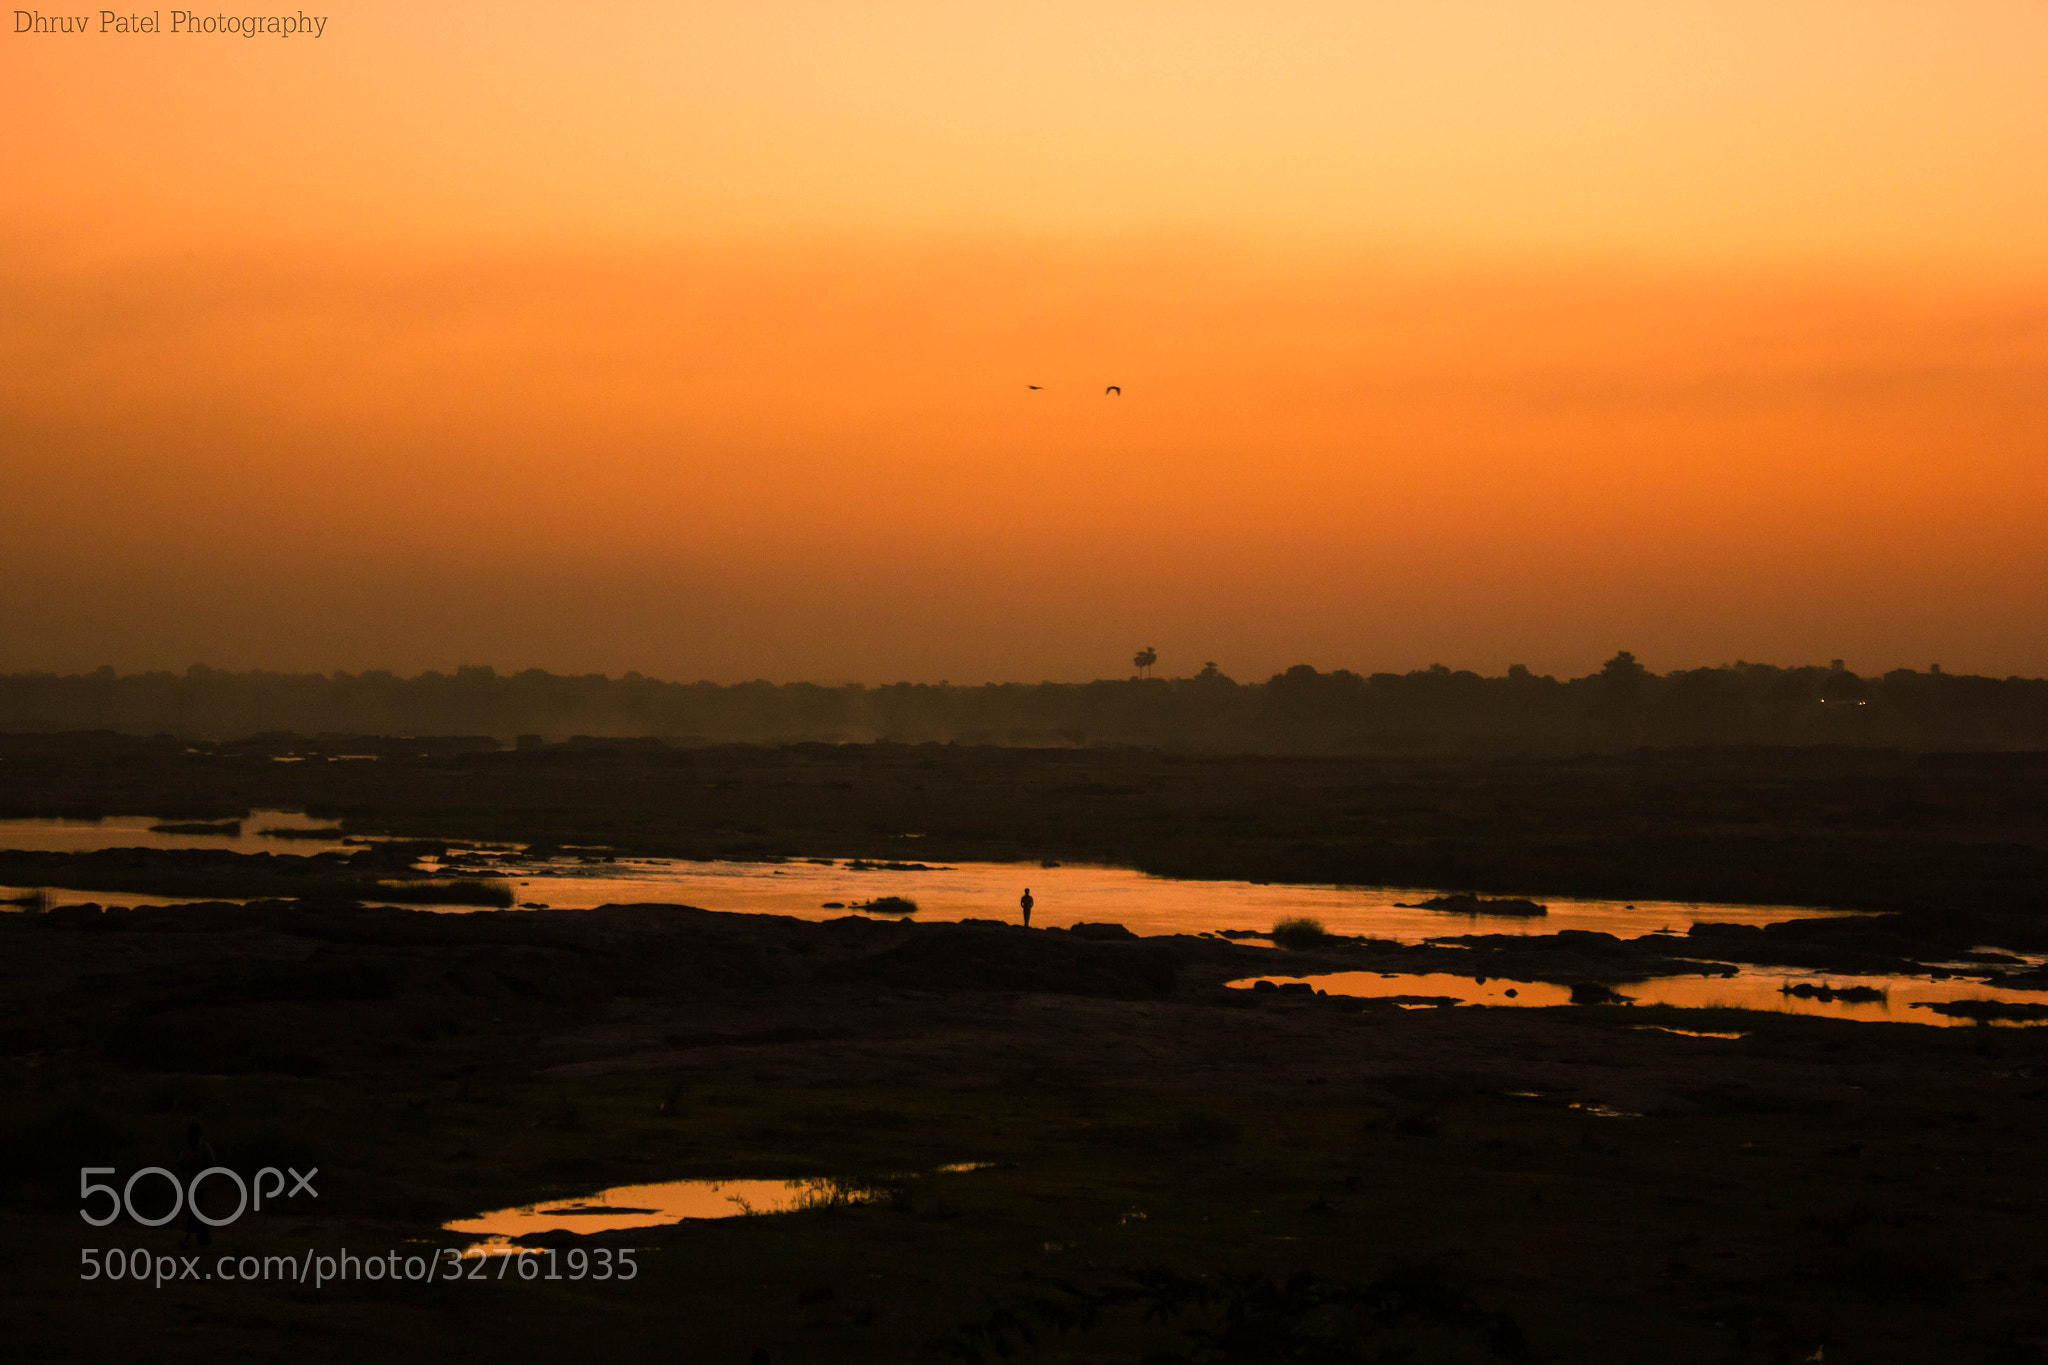 Photograph Morning Prayer by Dhruv Patel on 500px